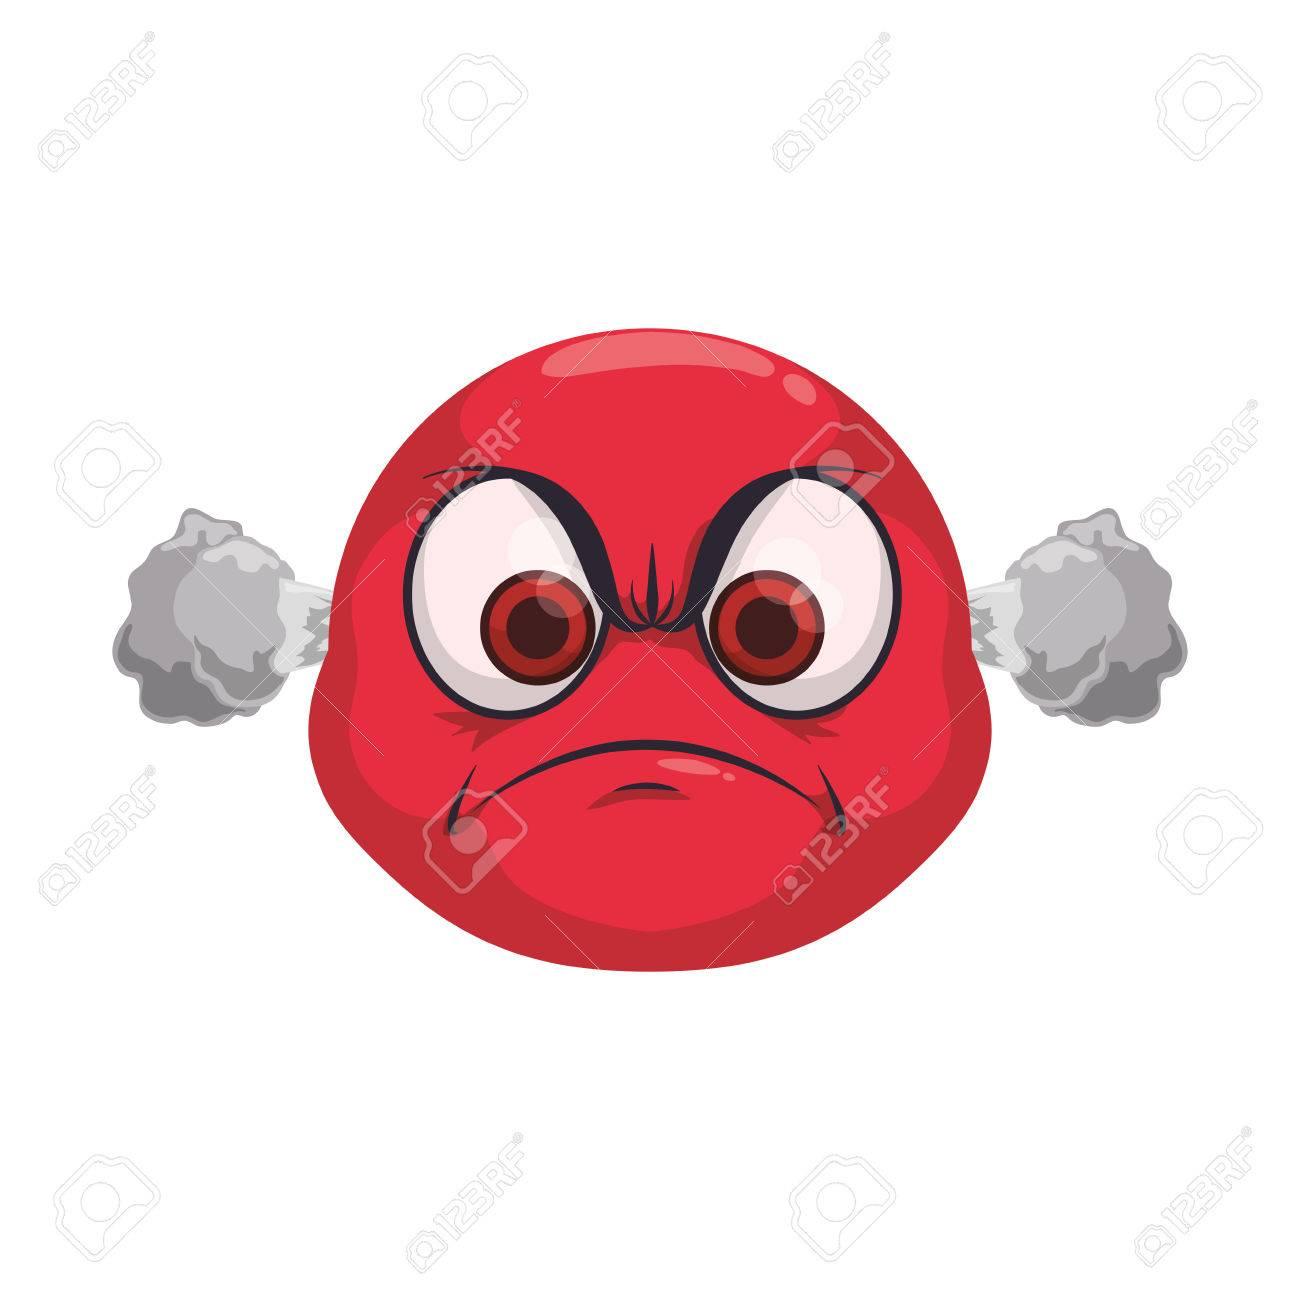 angry cartoon face icon vector illustration graphic design royalty rh 123rf com angry cartoon face pic angry cartoon face pic